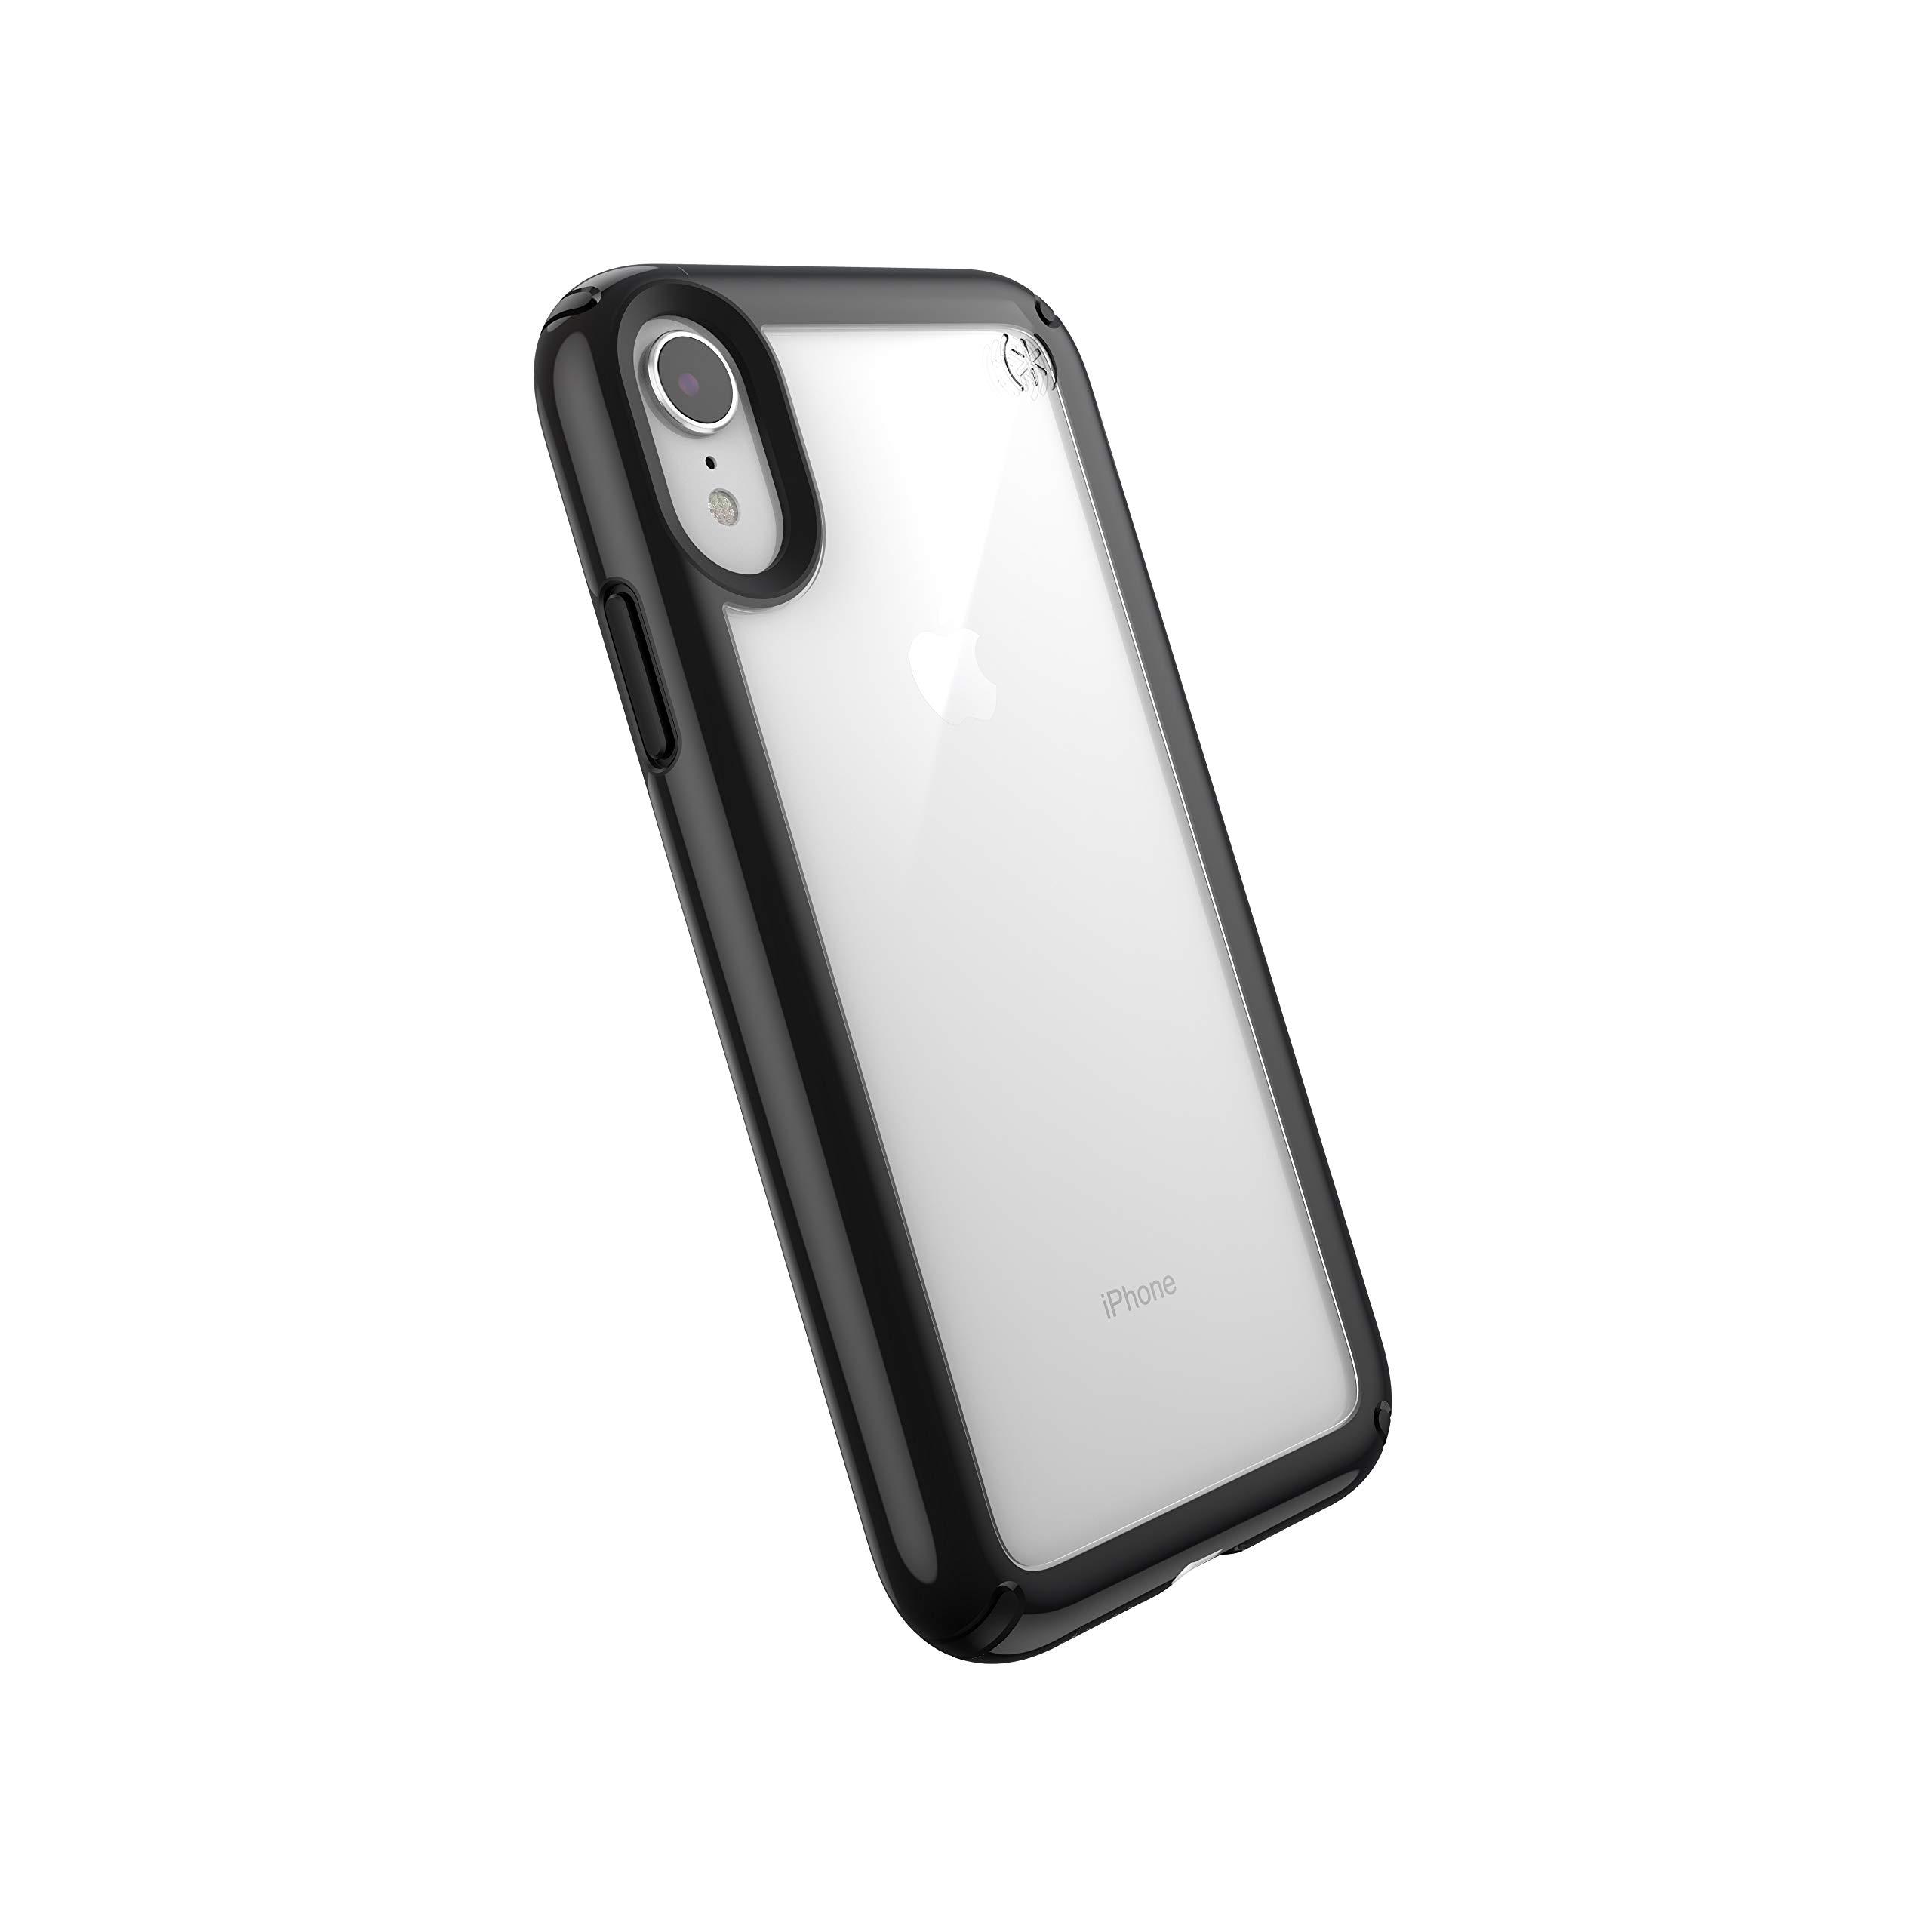 Funda Para iPhone Xr Speck (7gsrx1xf)